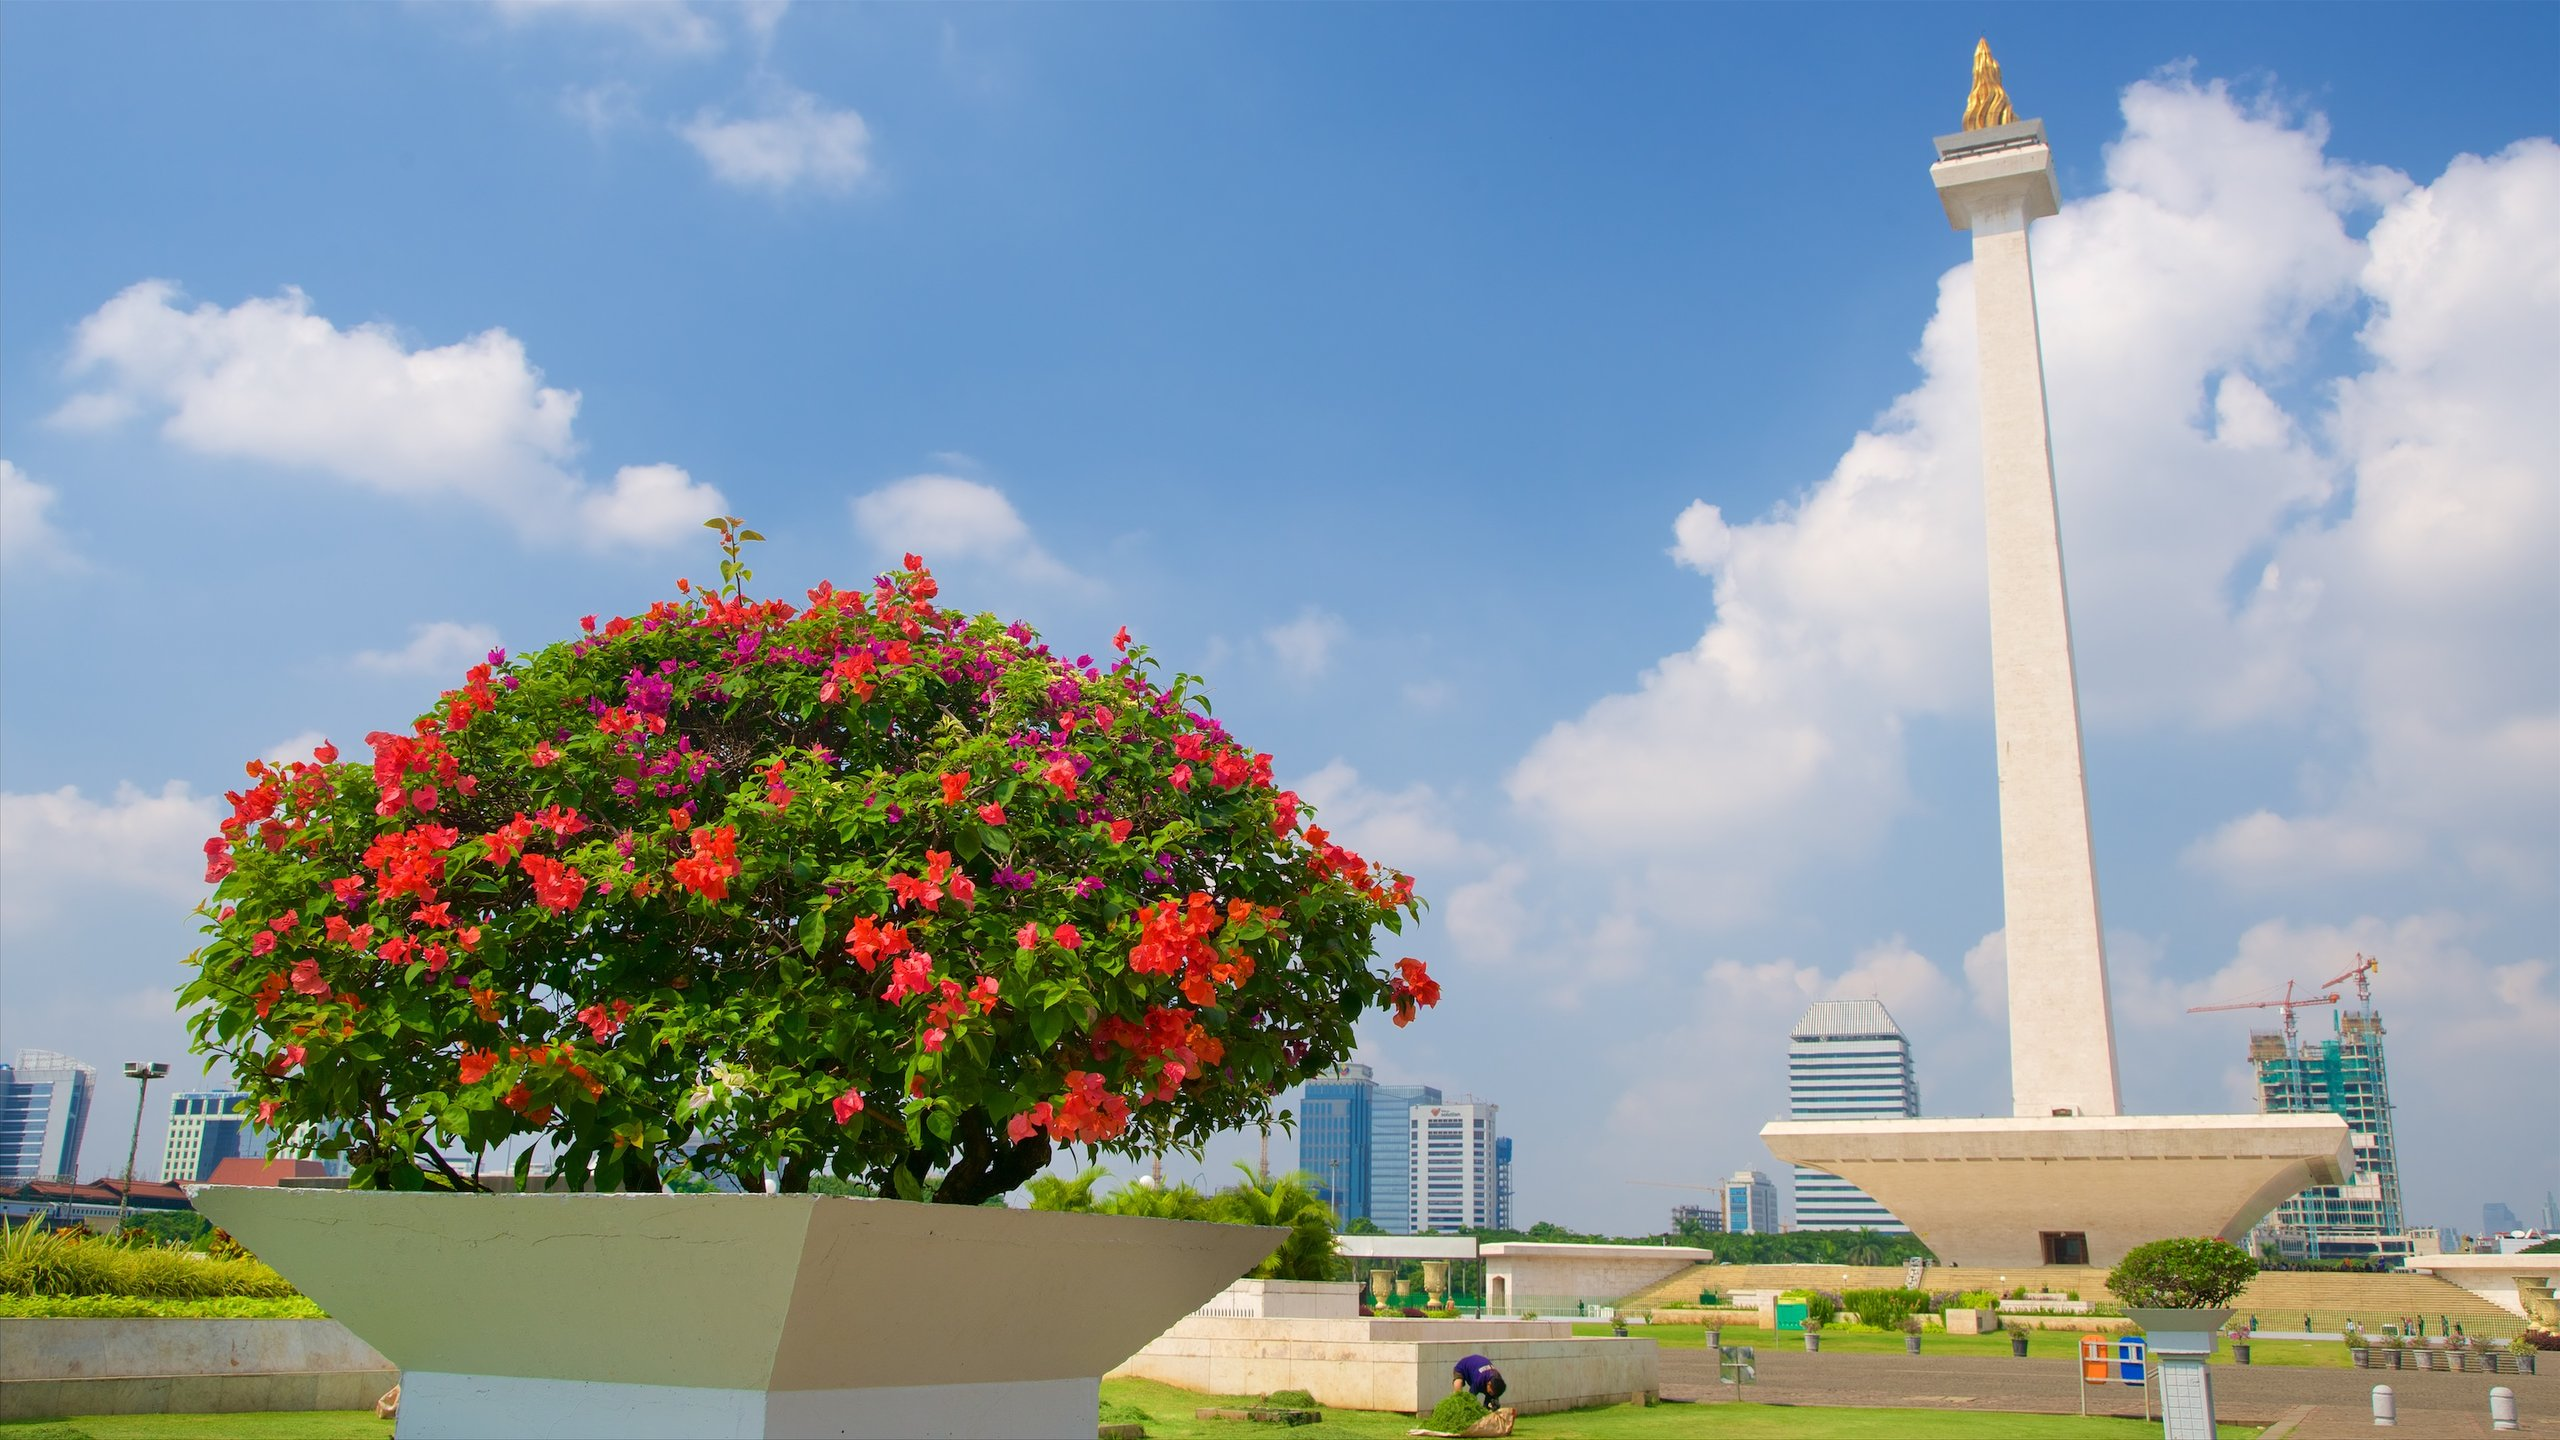 Central Jakarta, Jakarta, Special Capital Region of Jakarta, Indonesia